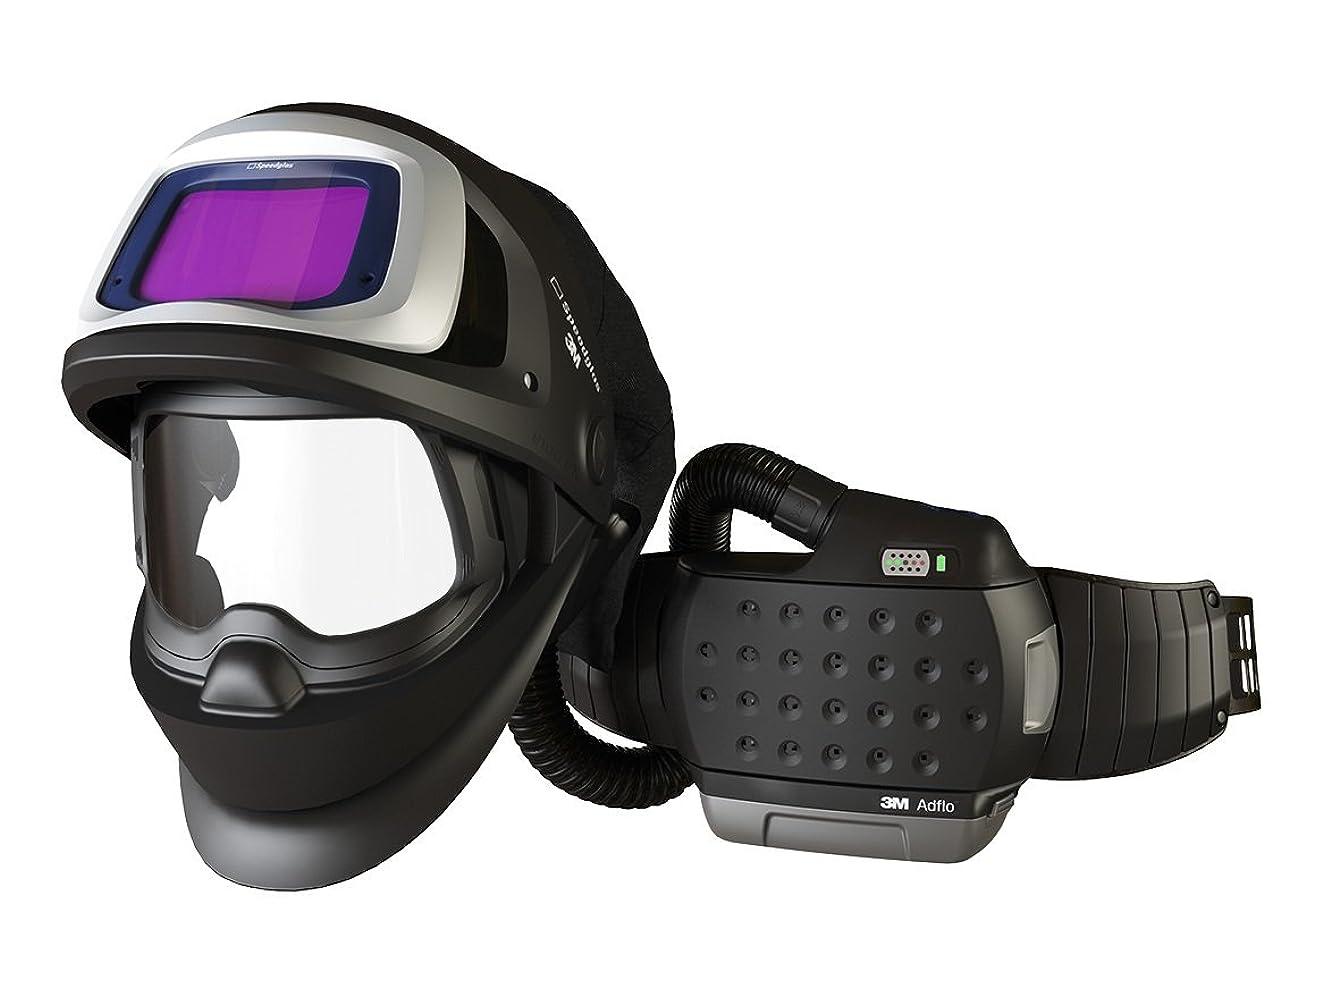 3M 36-1101-30SW Powered Air Purifying Respirator High Efficiency System with 3M Speedglas Welding Helmet 9100 FX-Air, Lithium Ion Battery, Side Windows and Auto-Darkening Filter 9100XX, Shades 5, 8-13